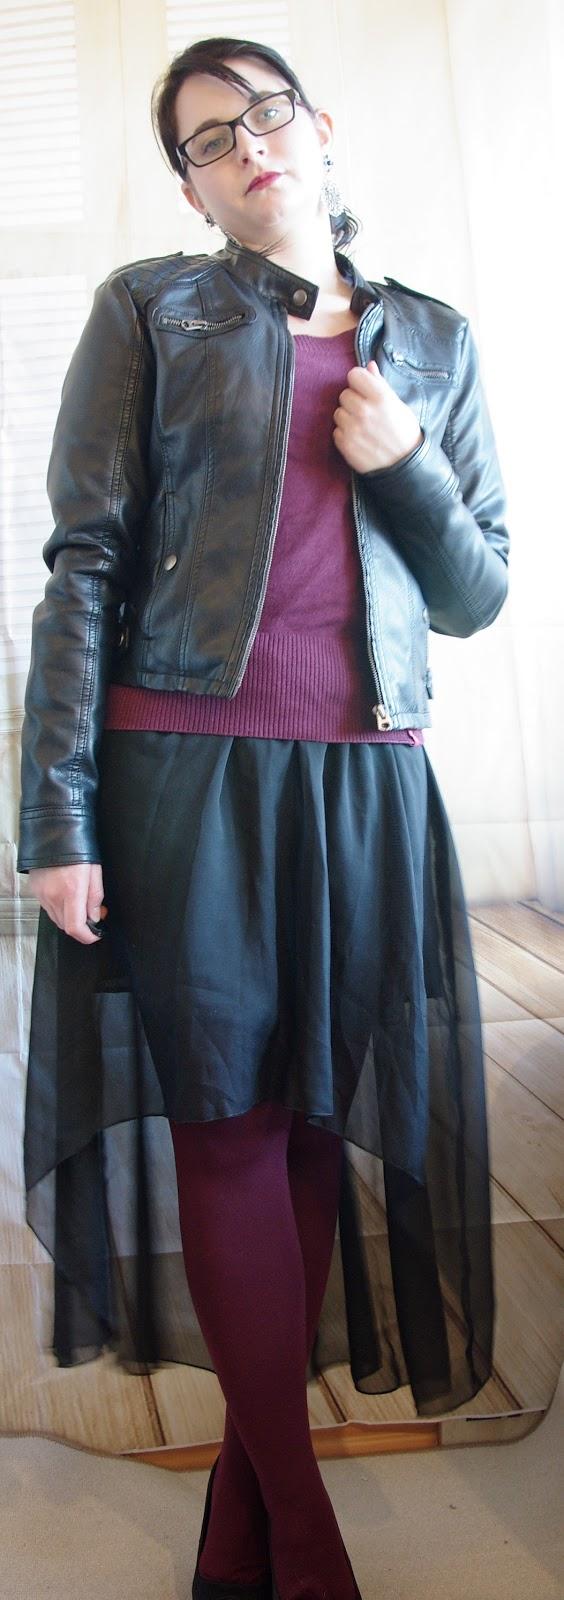 lucciola outfit vokuhila rock farbige strumpfhose und strickpullover und lederjacke winter. Black Bedroom Furniture Sets. Home Design Ideas